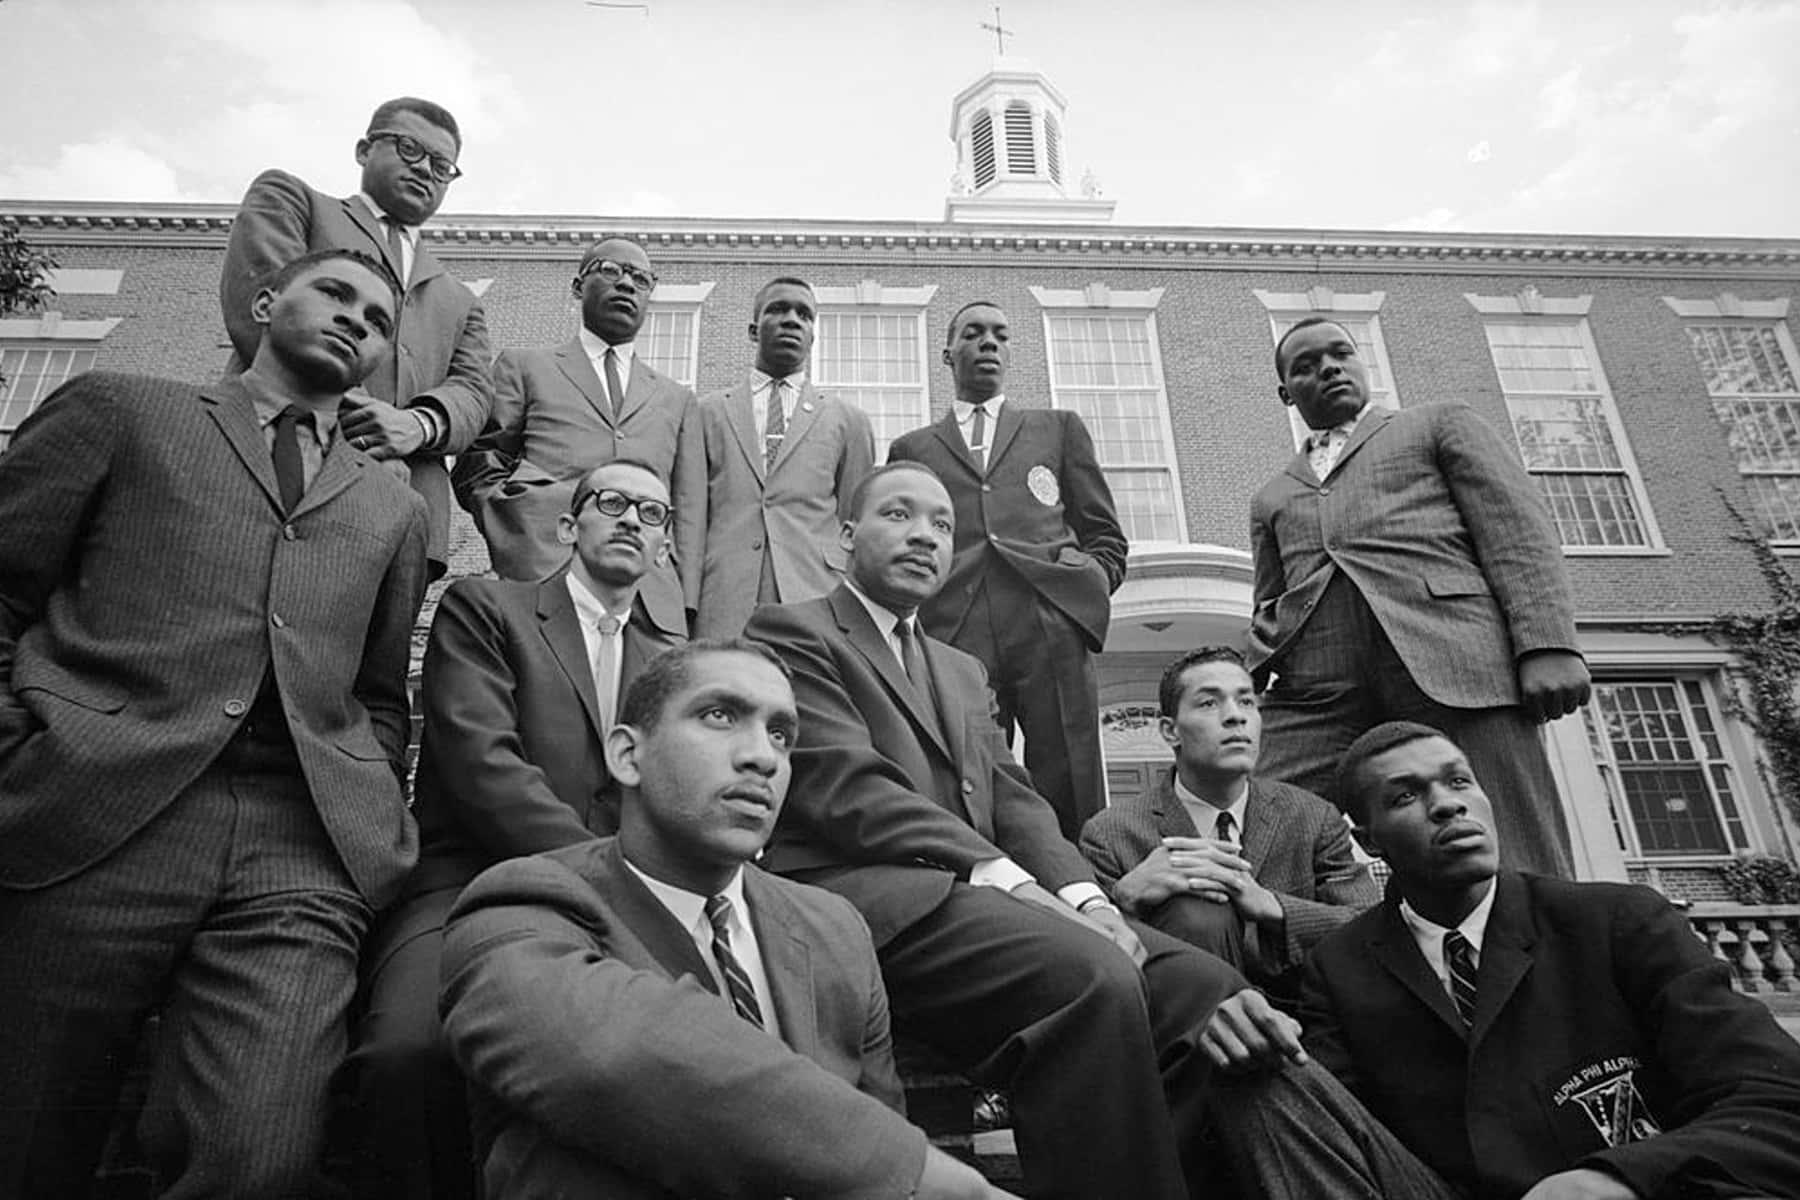 Cultural Amnesia The Civil Rights Era Had Many Leaders